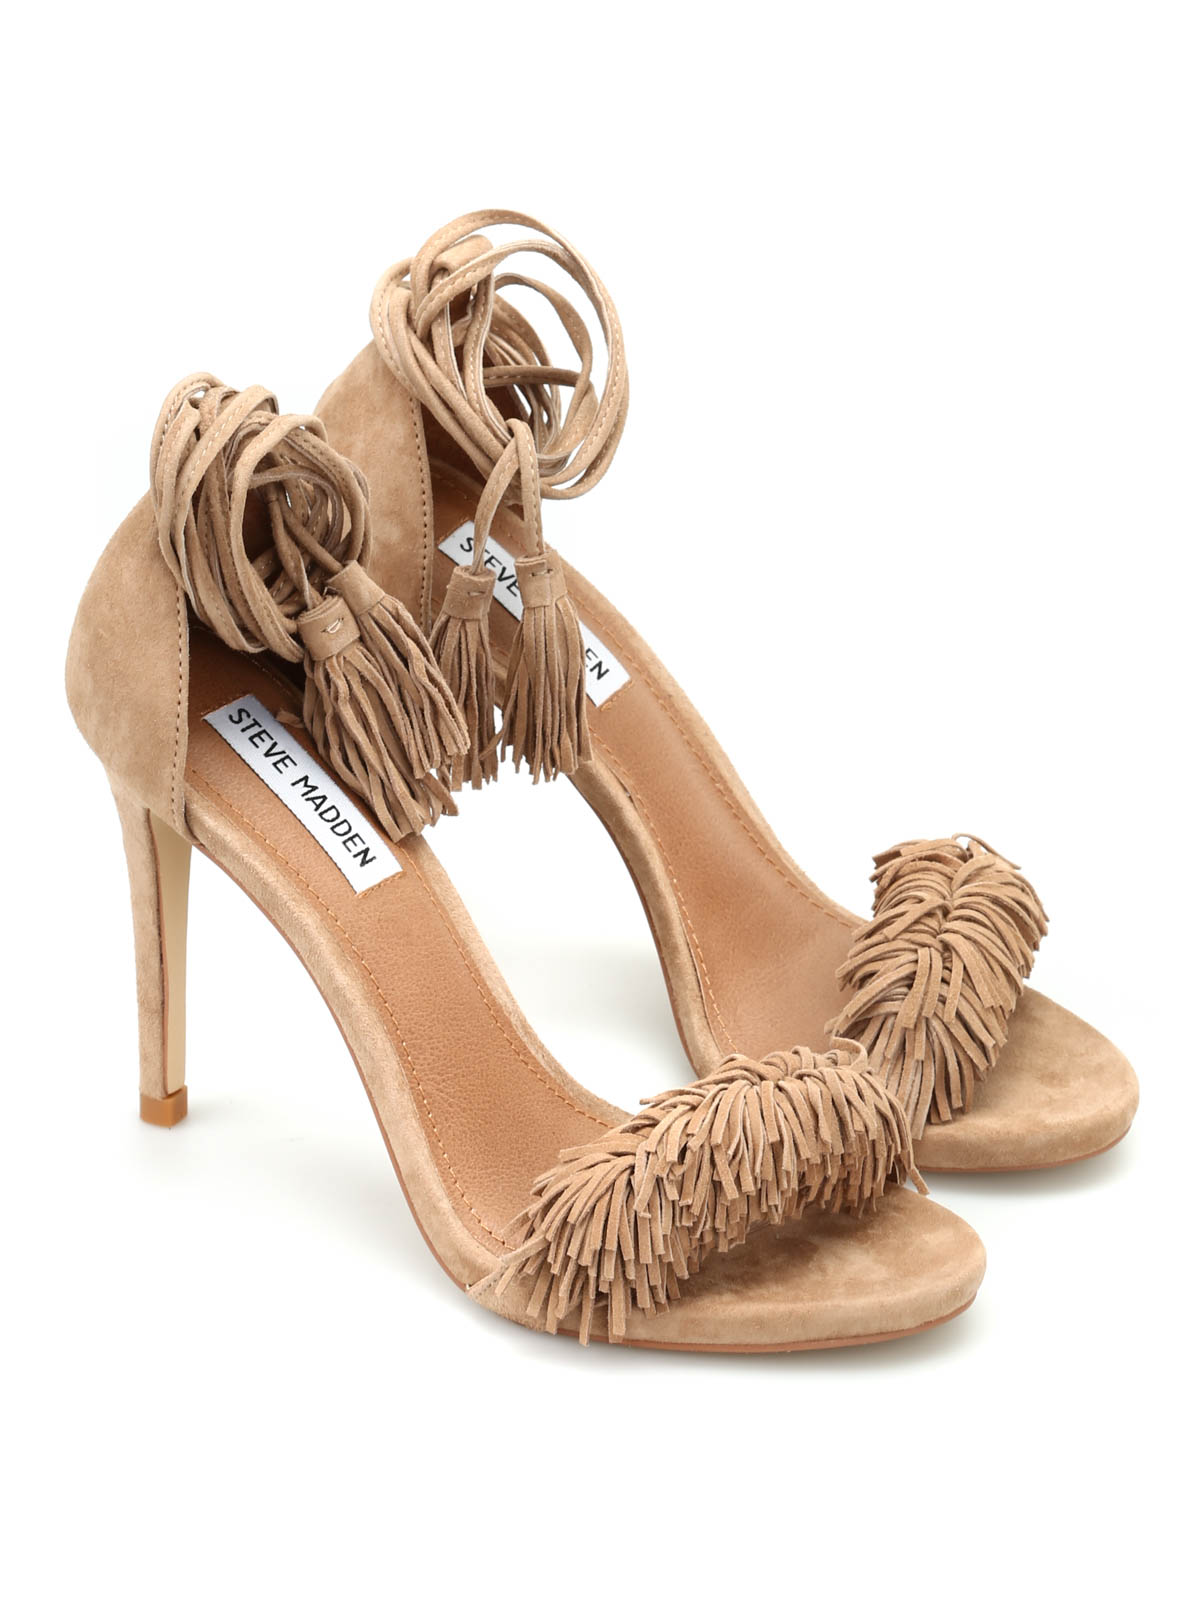 6bbb3c6fae5 Steve Madden - Sassey sandals - sandals - SASSEY BLUSH | iKRIX.com